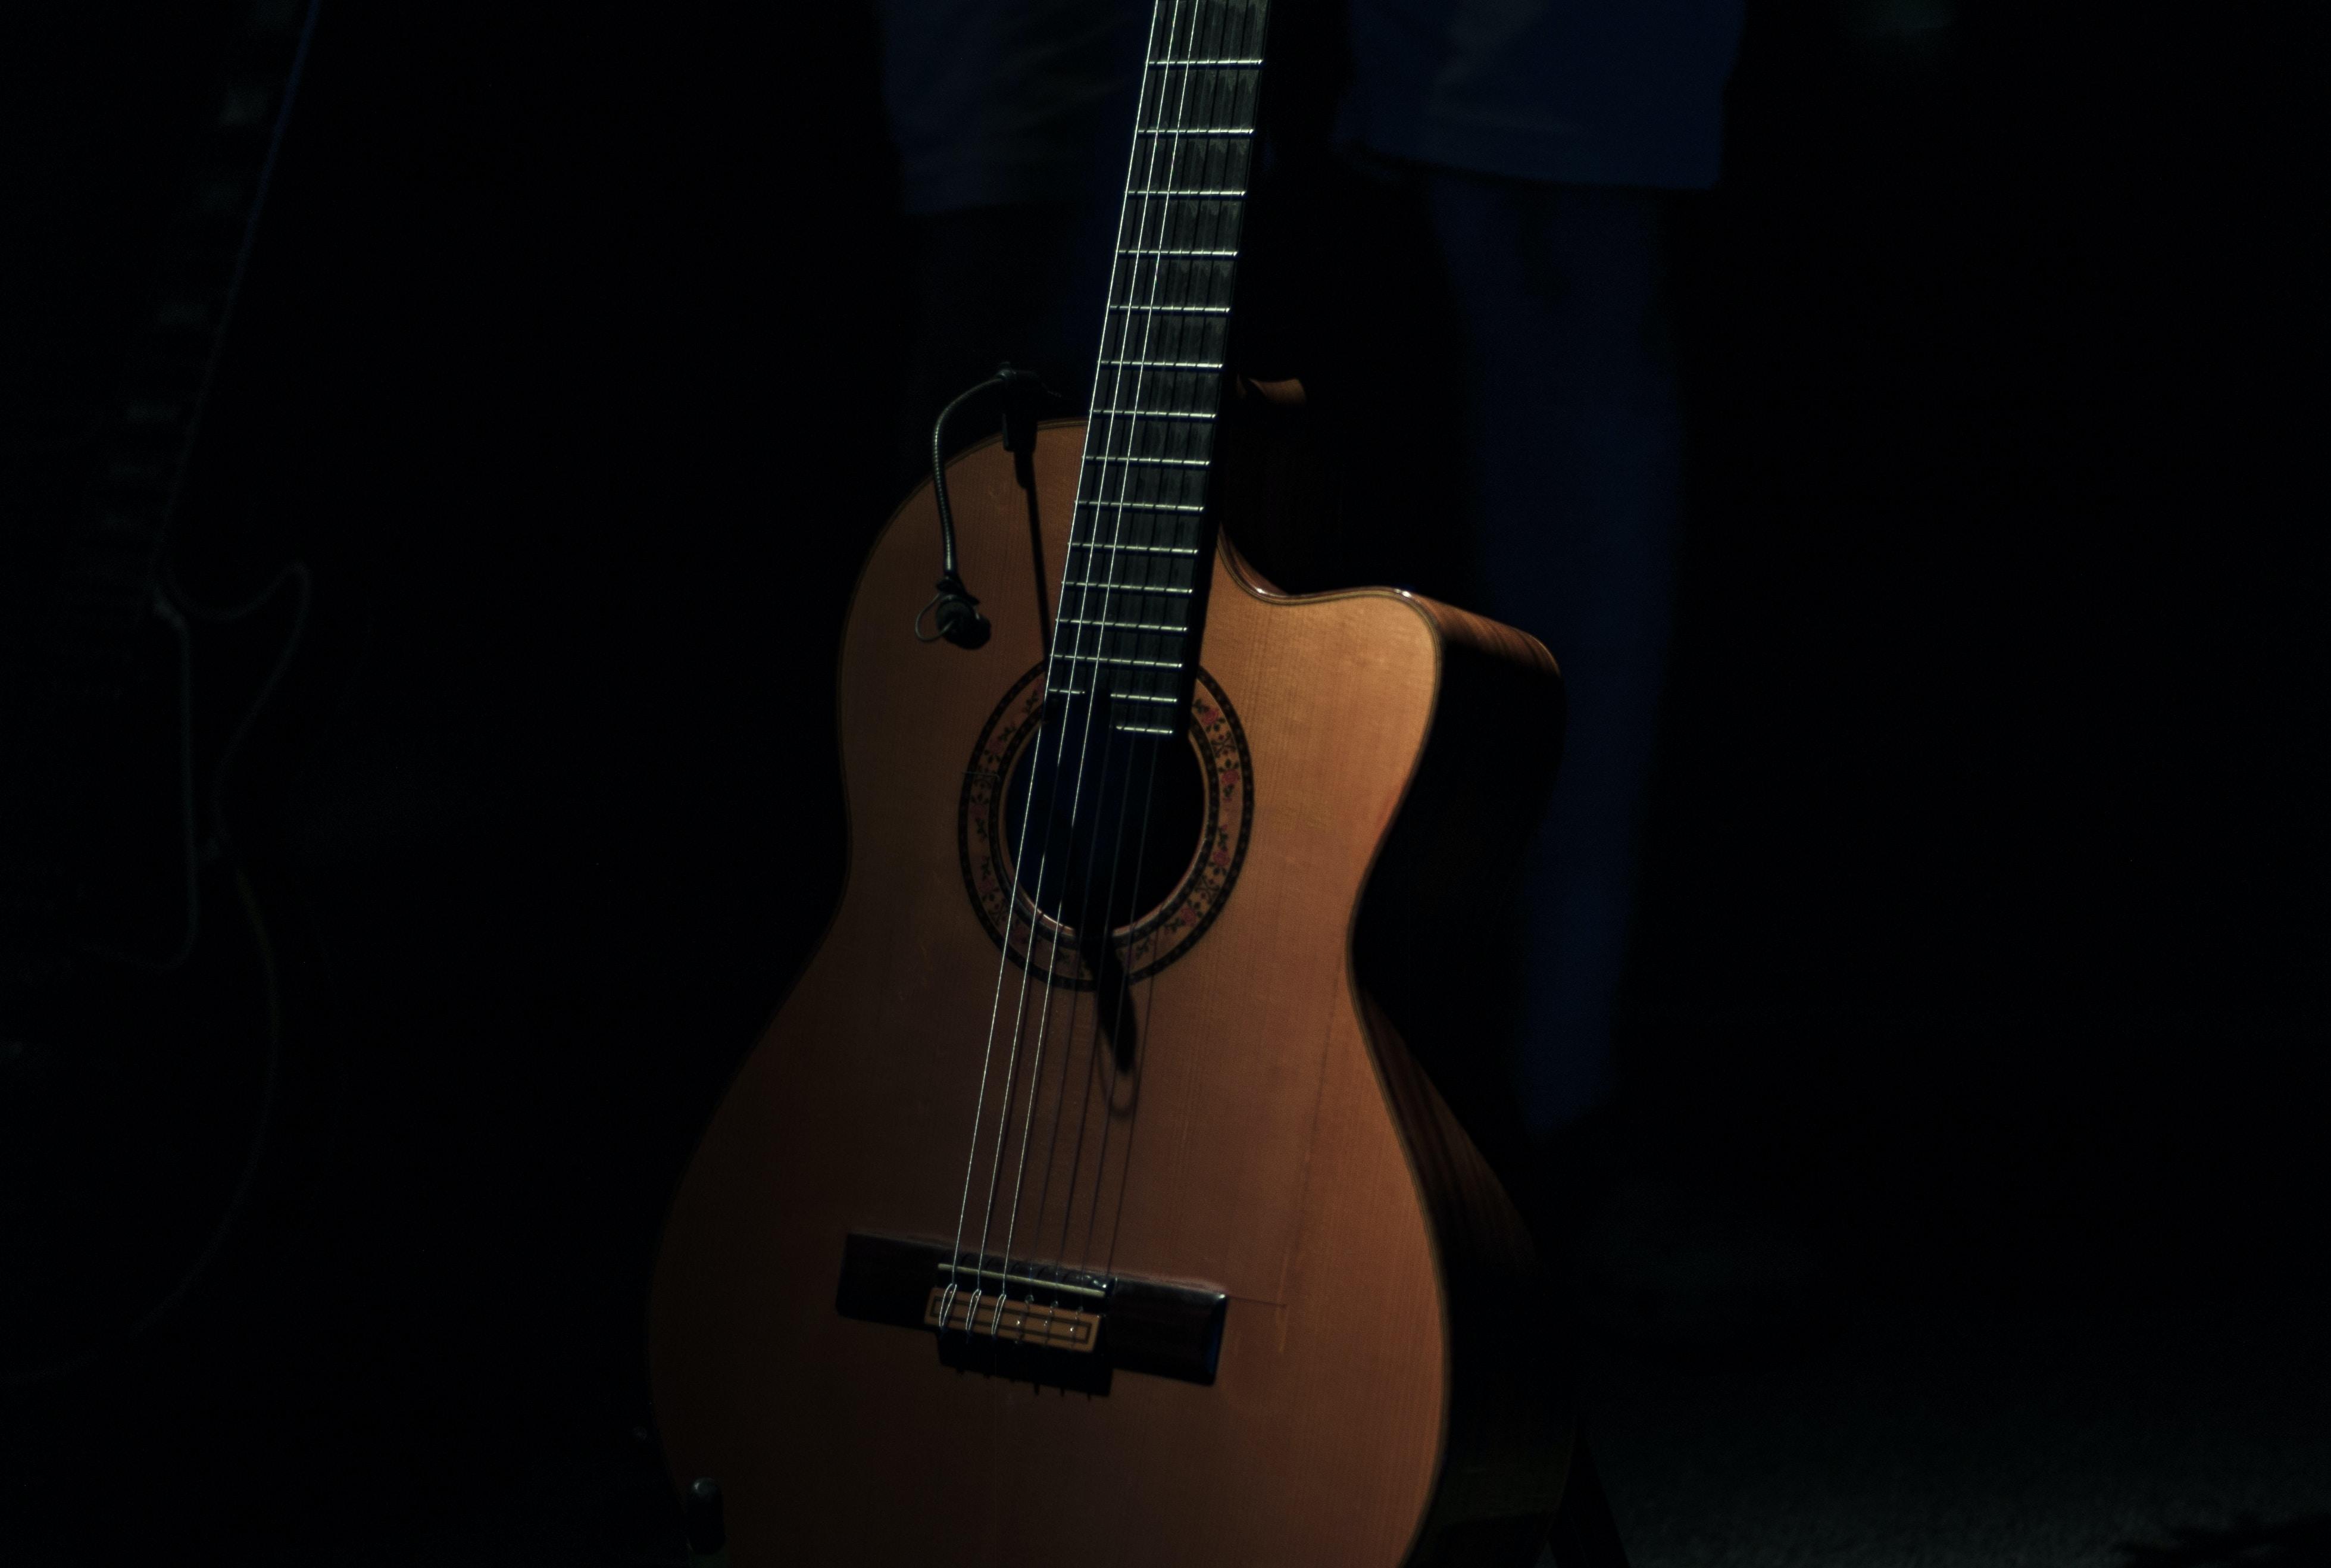 brown cutaway acoustic guitar